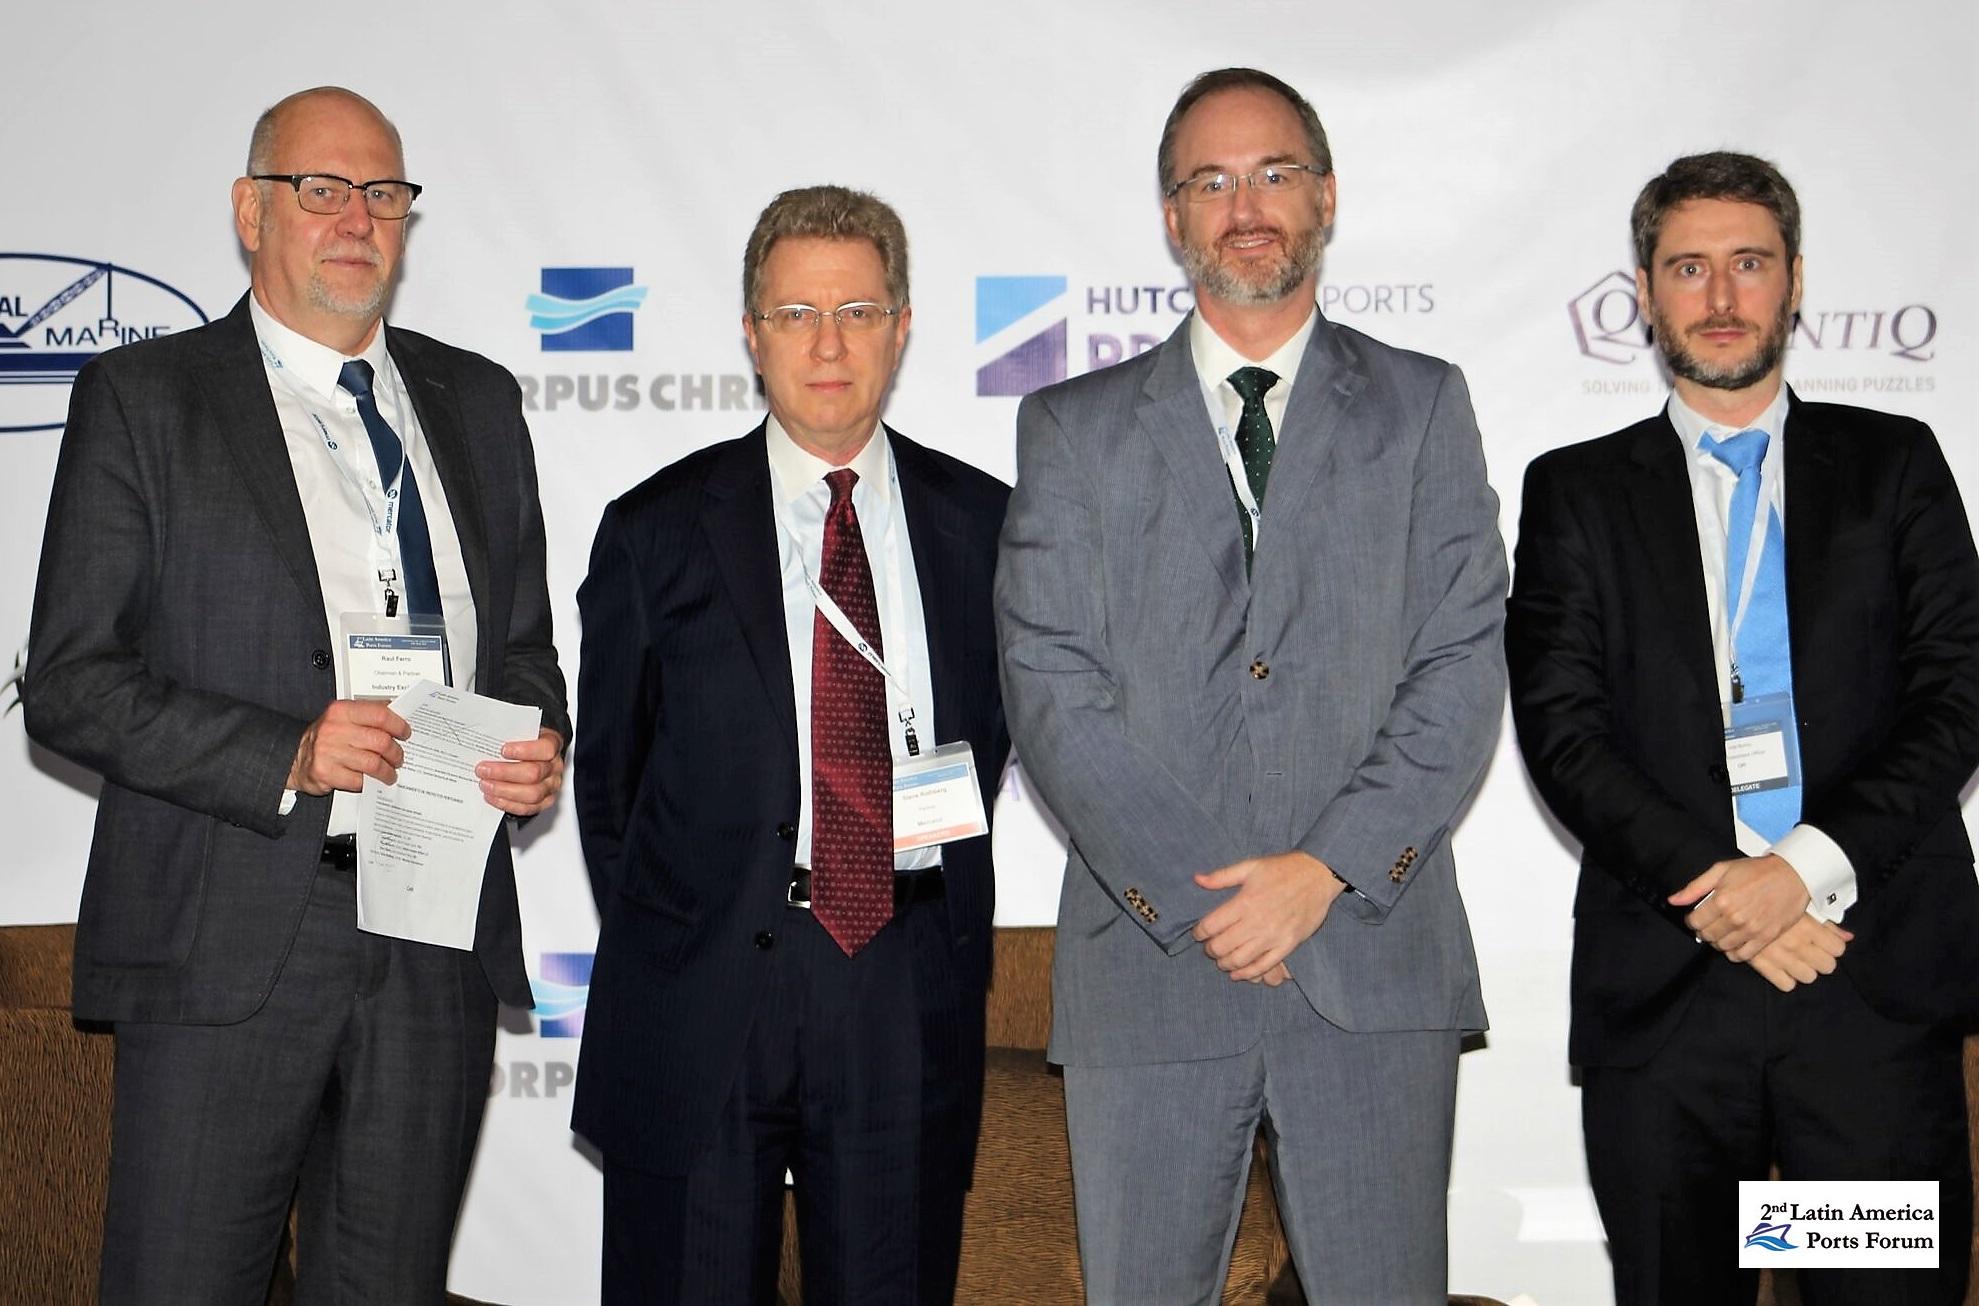 Latin America Ports Finance Panel